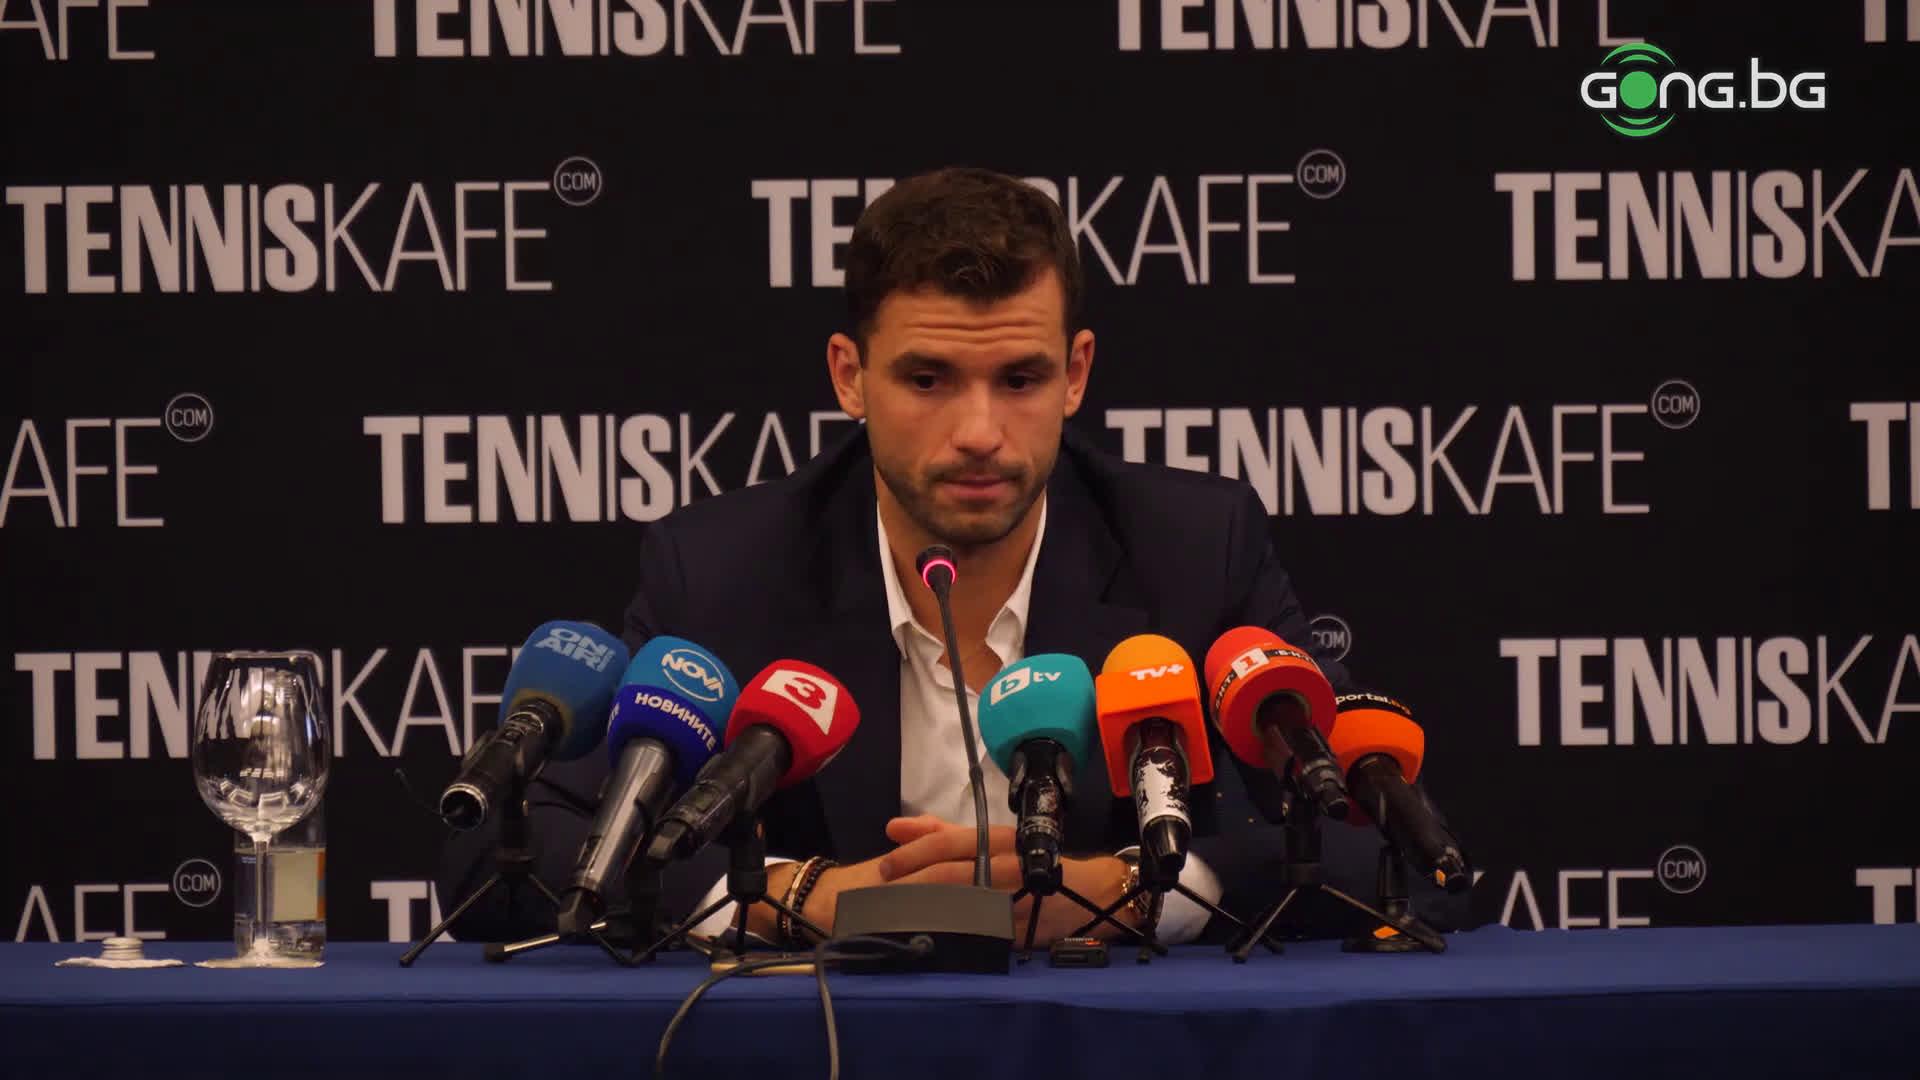 Григор сподели до кога ще играе тенис